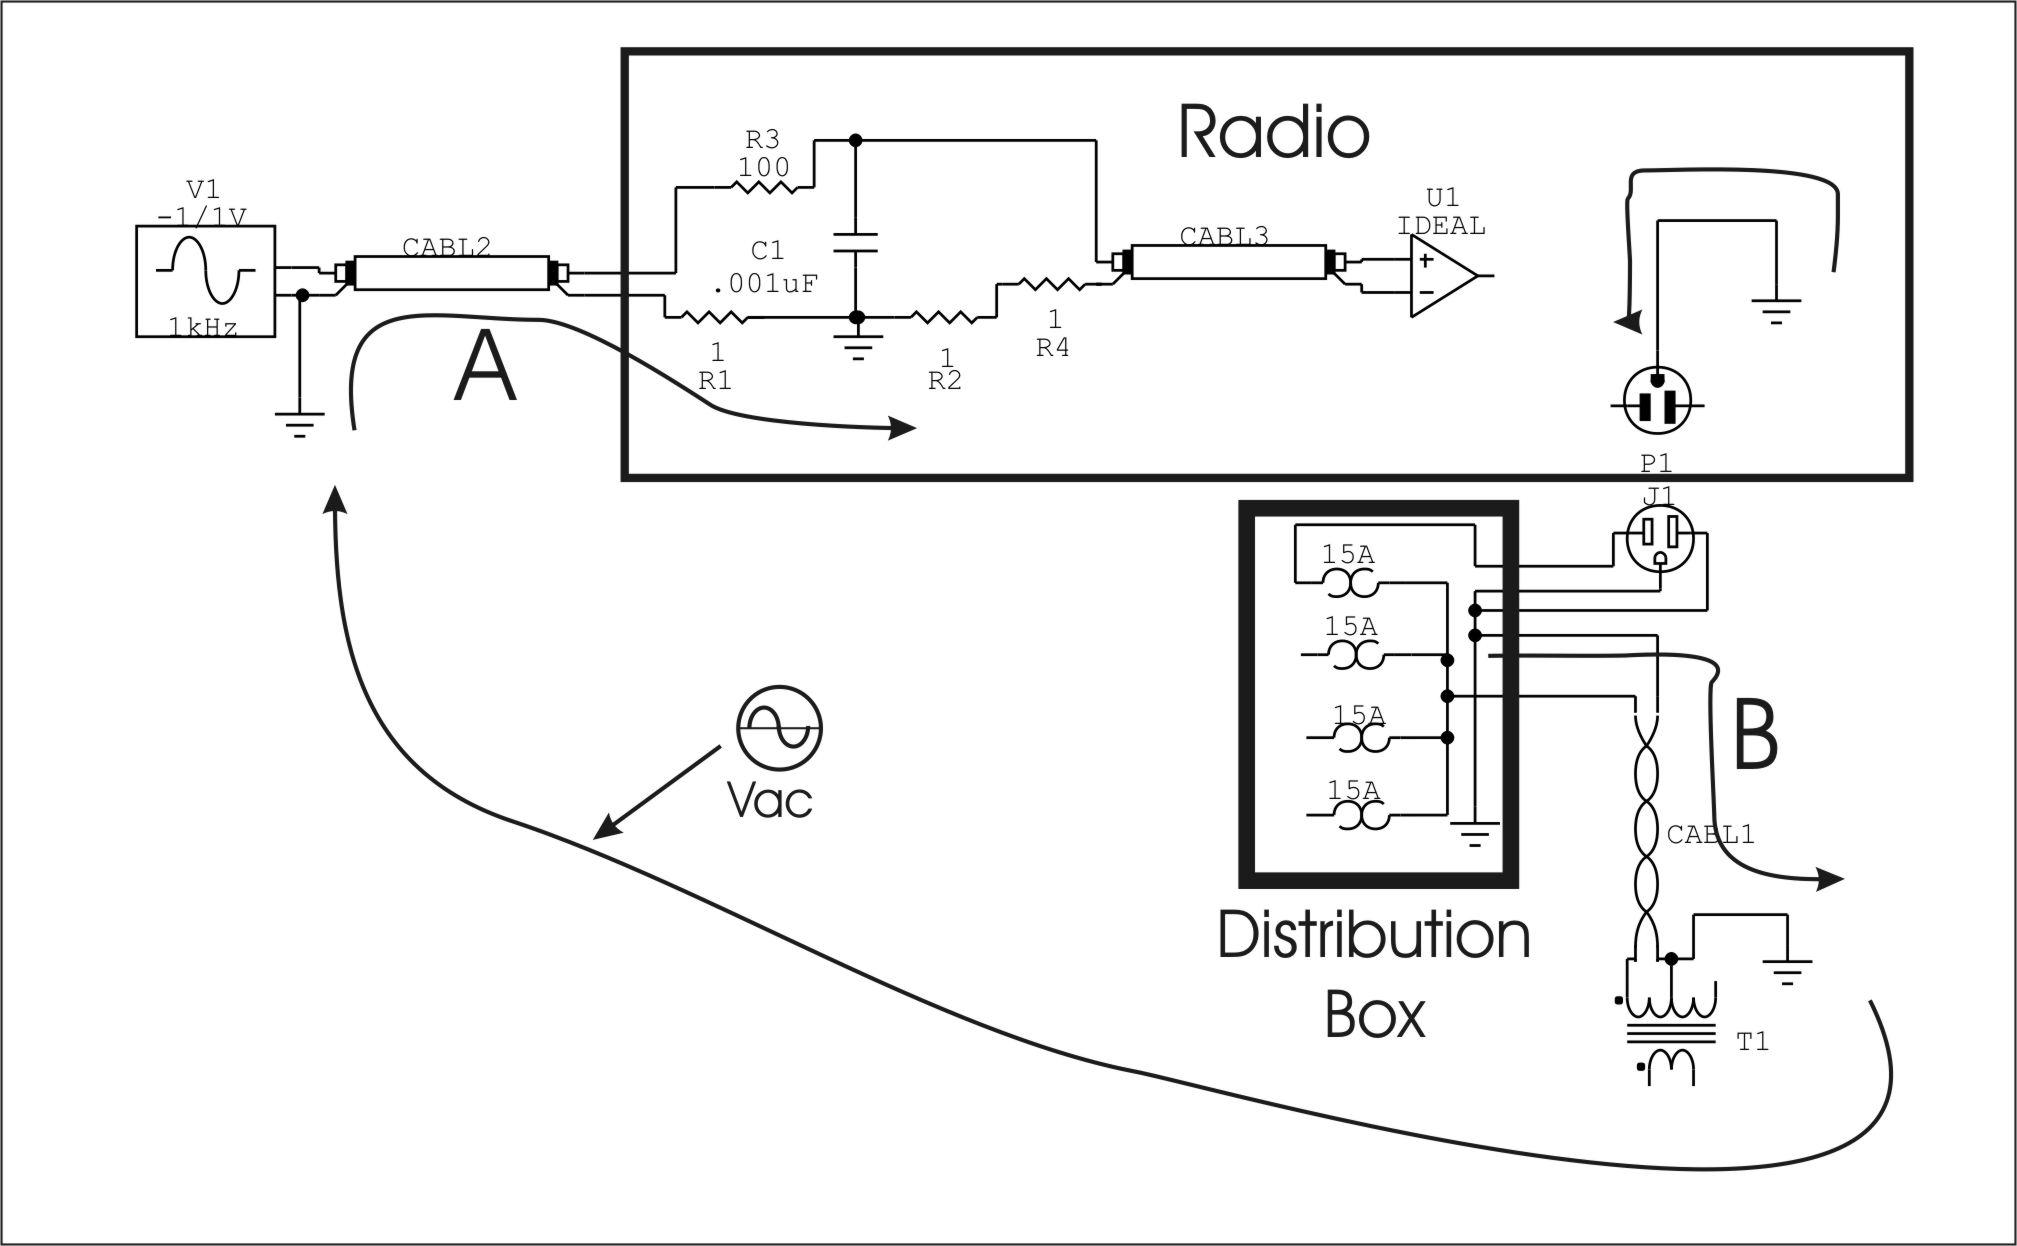 electrical wiring diagrams explained dodge caravan serpentine belt diagram your home system  readingrat